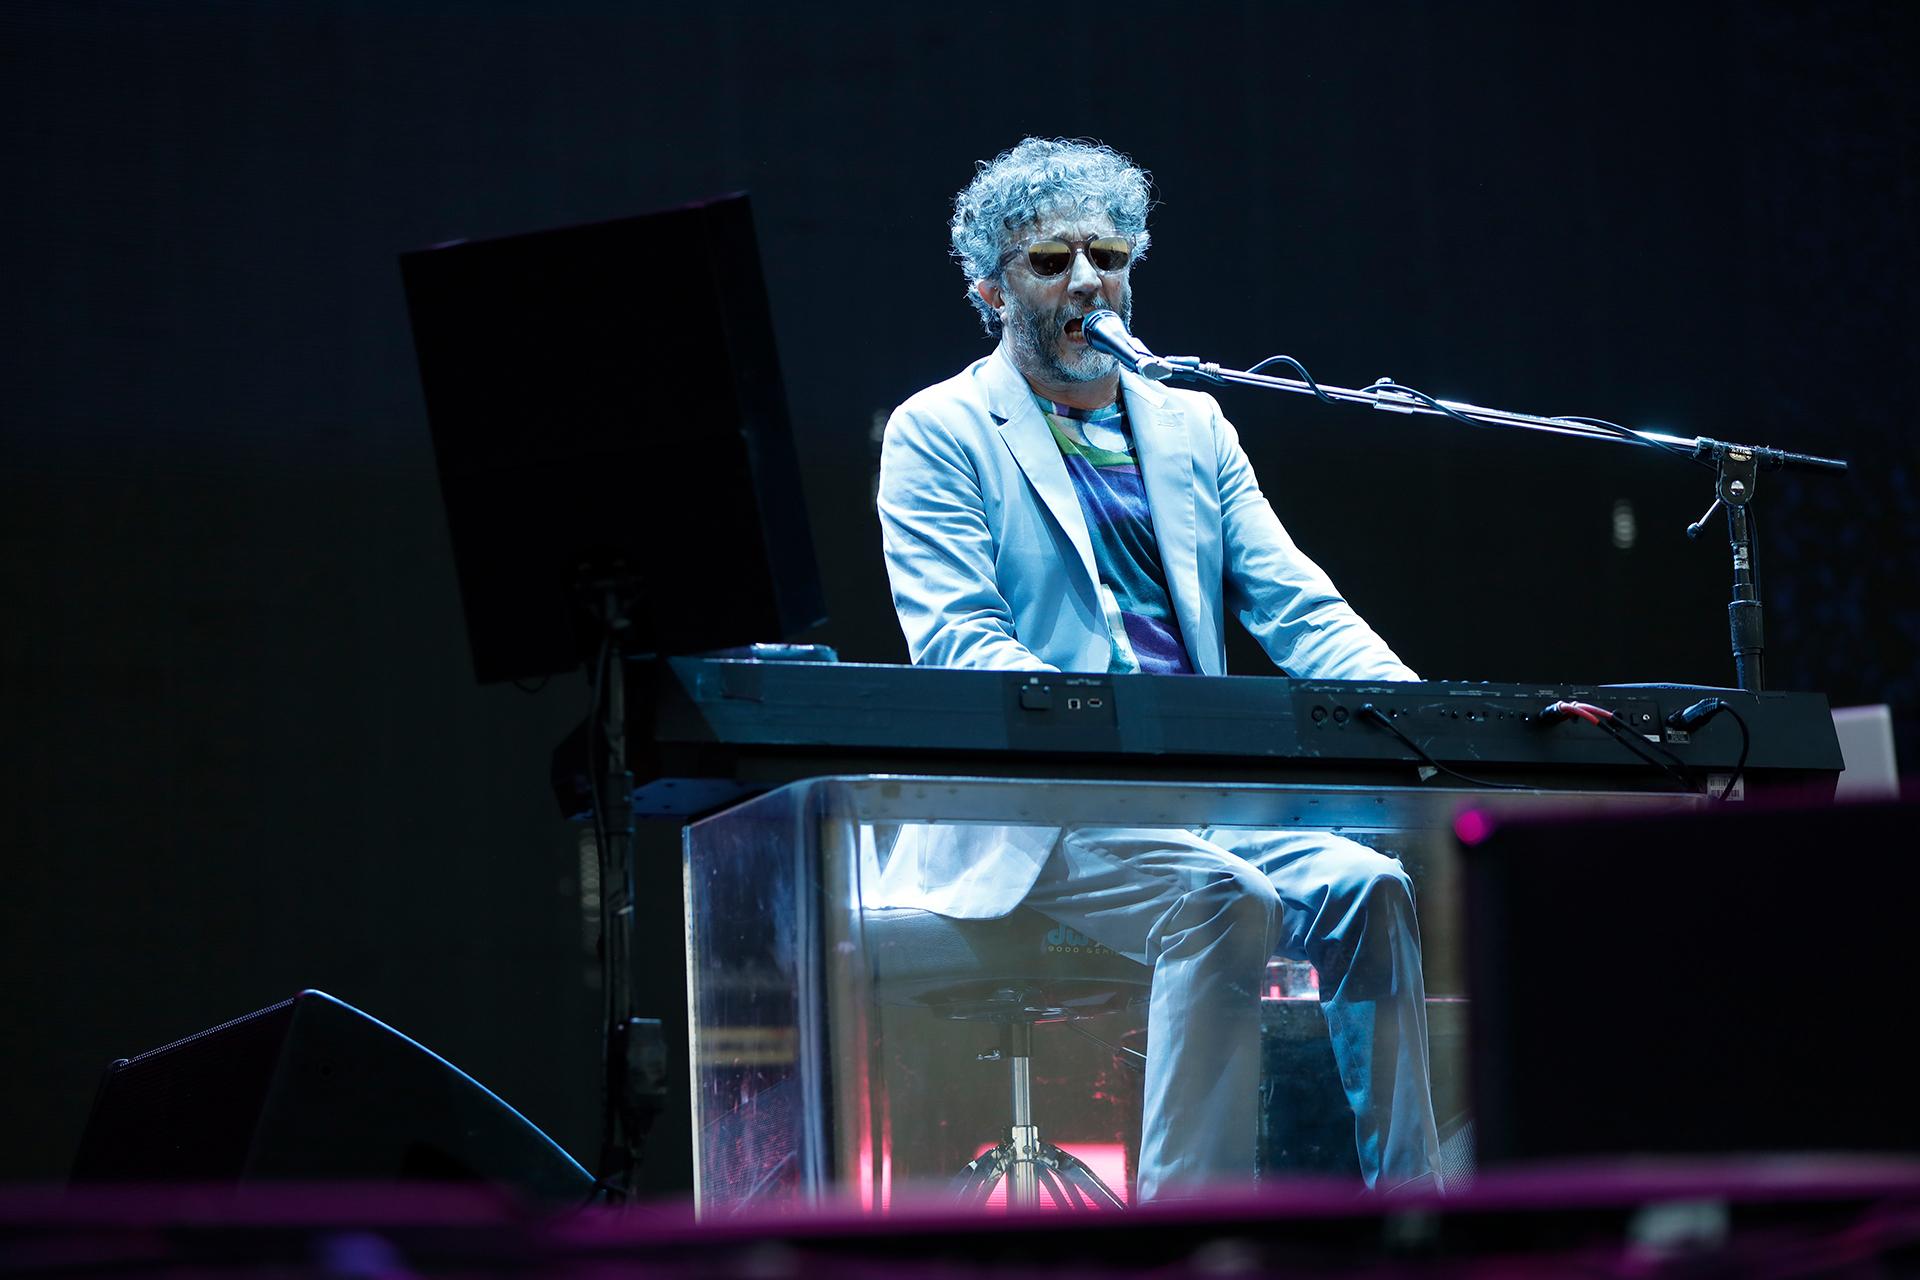 Fito Páez, en pleno show (Chule Valerga)